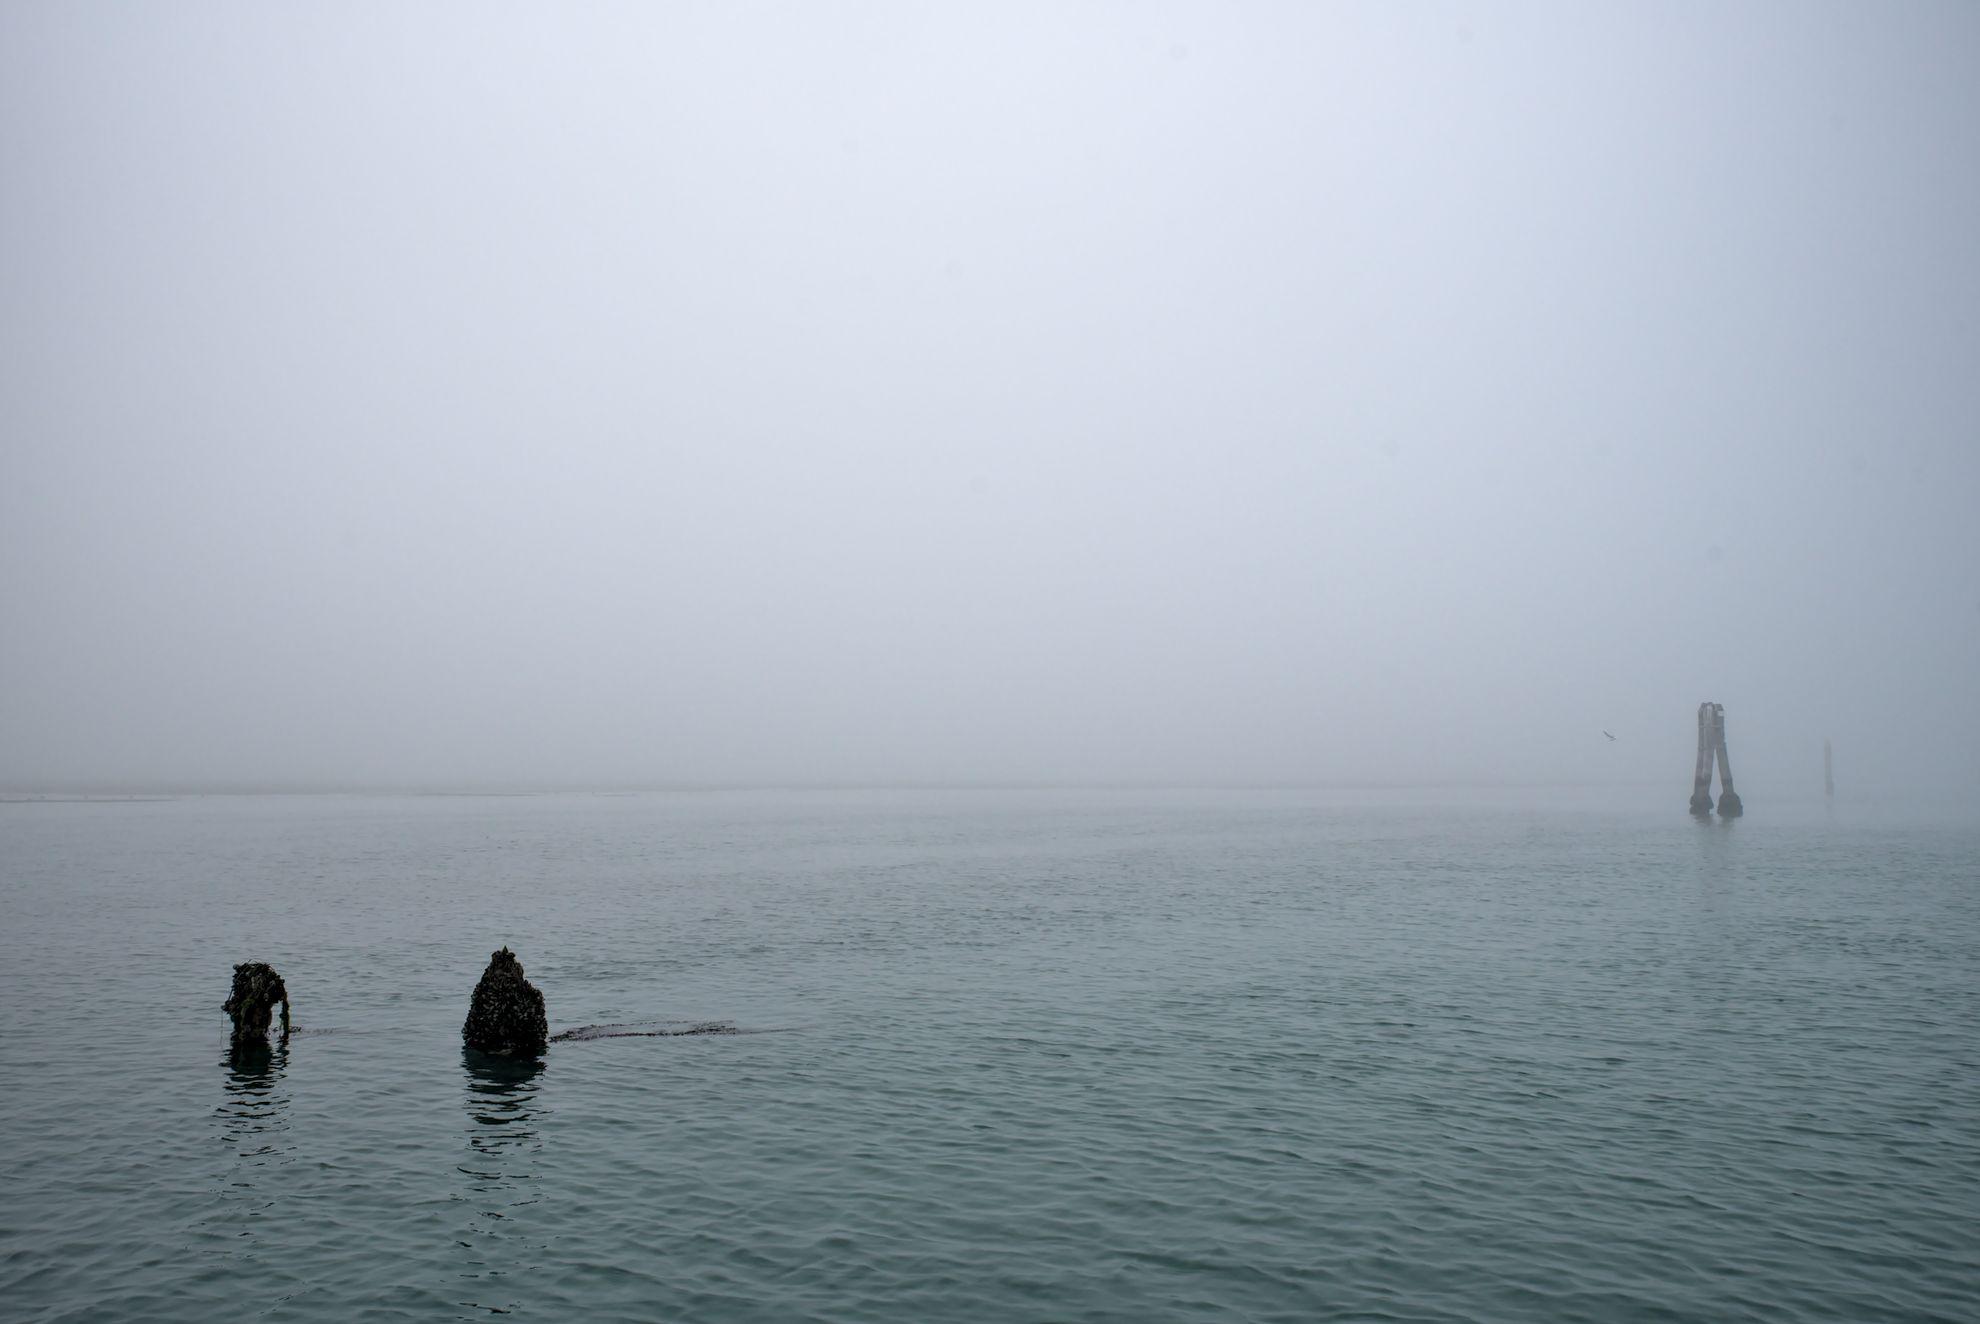 The Venetian lagoon on the fog - broken briccola